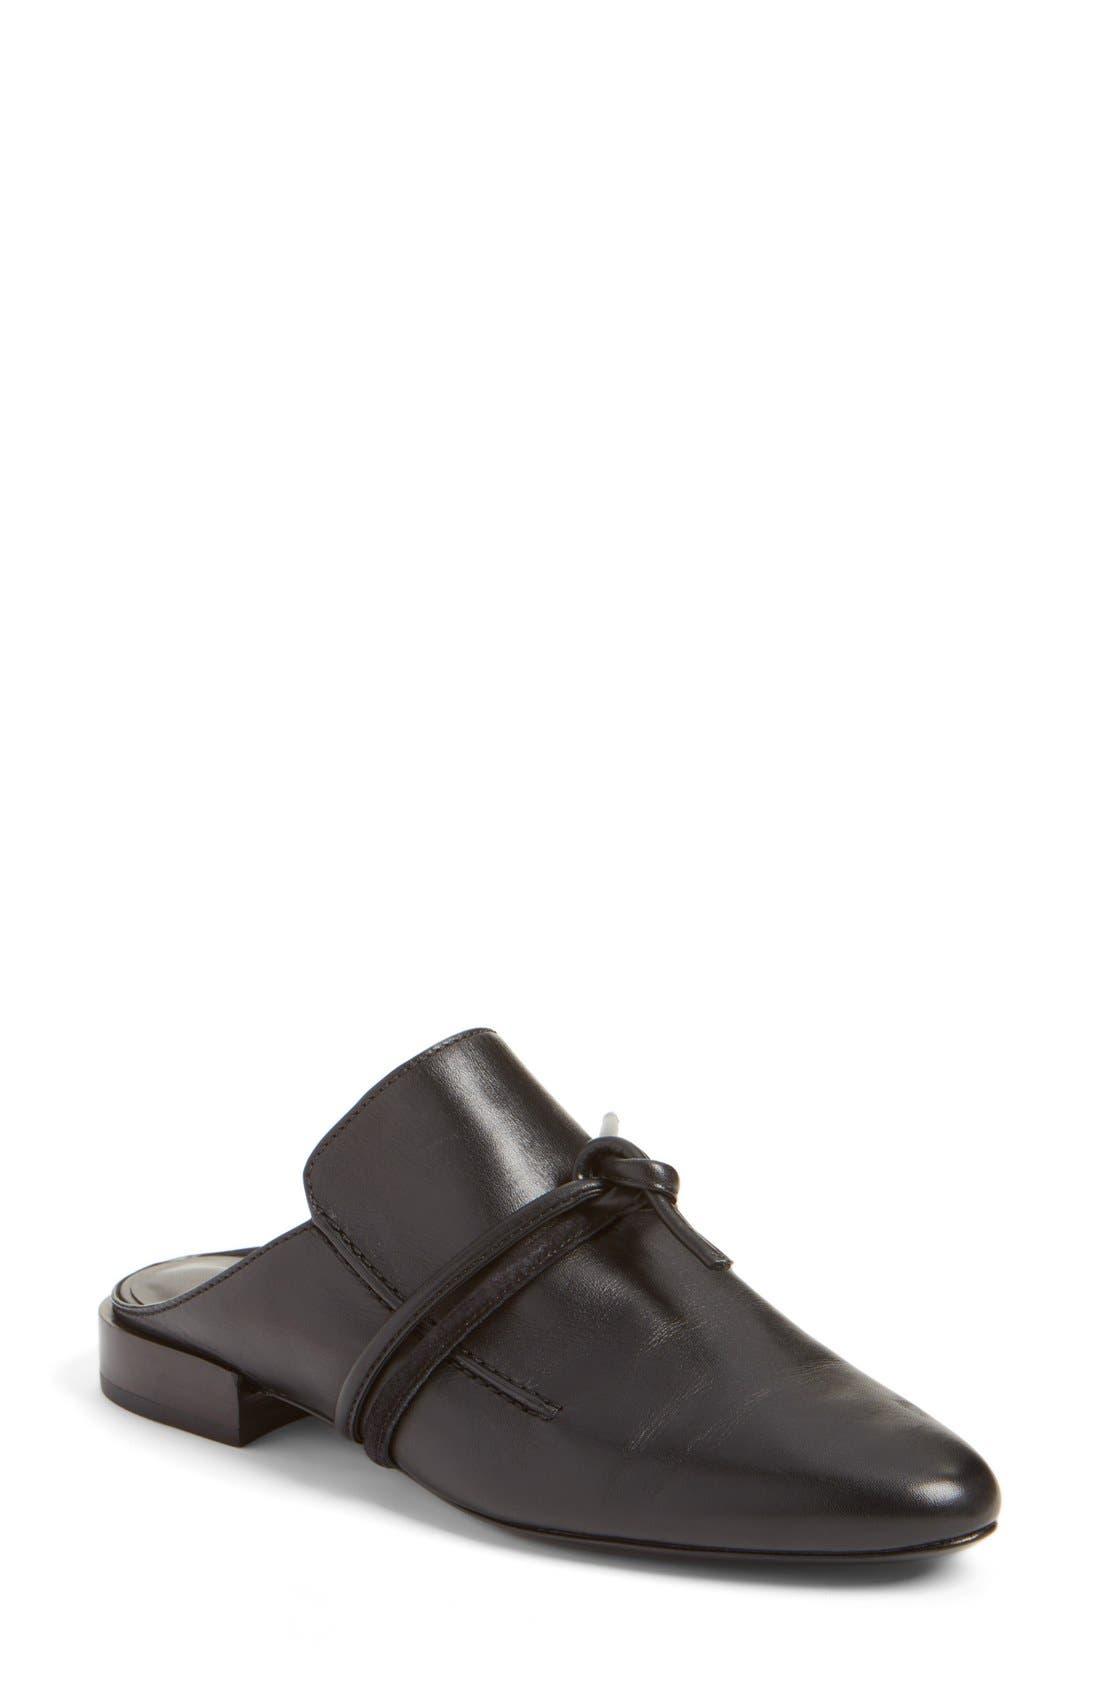 Louie Mule Loafer,                         Main,                         color, Black Box Calf